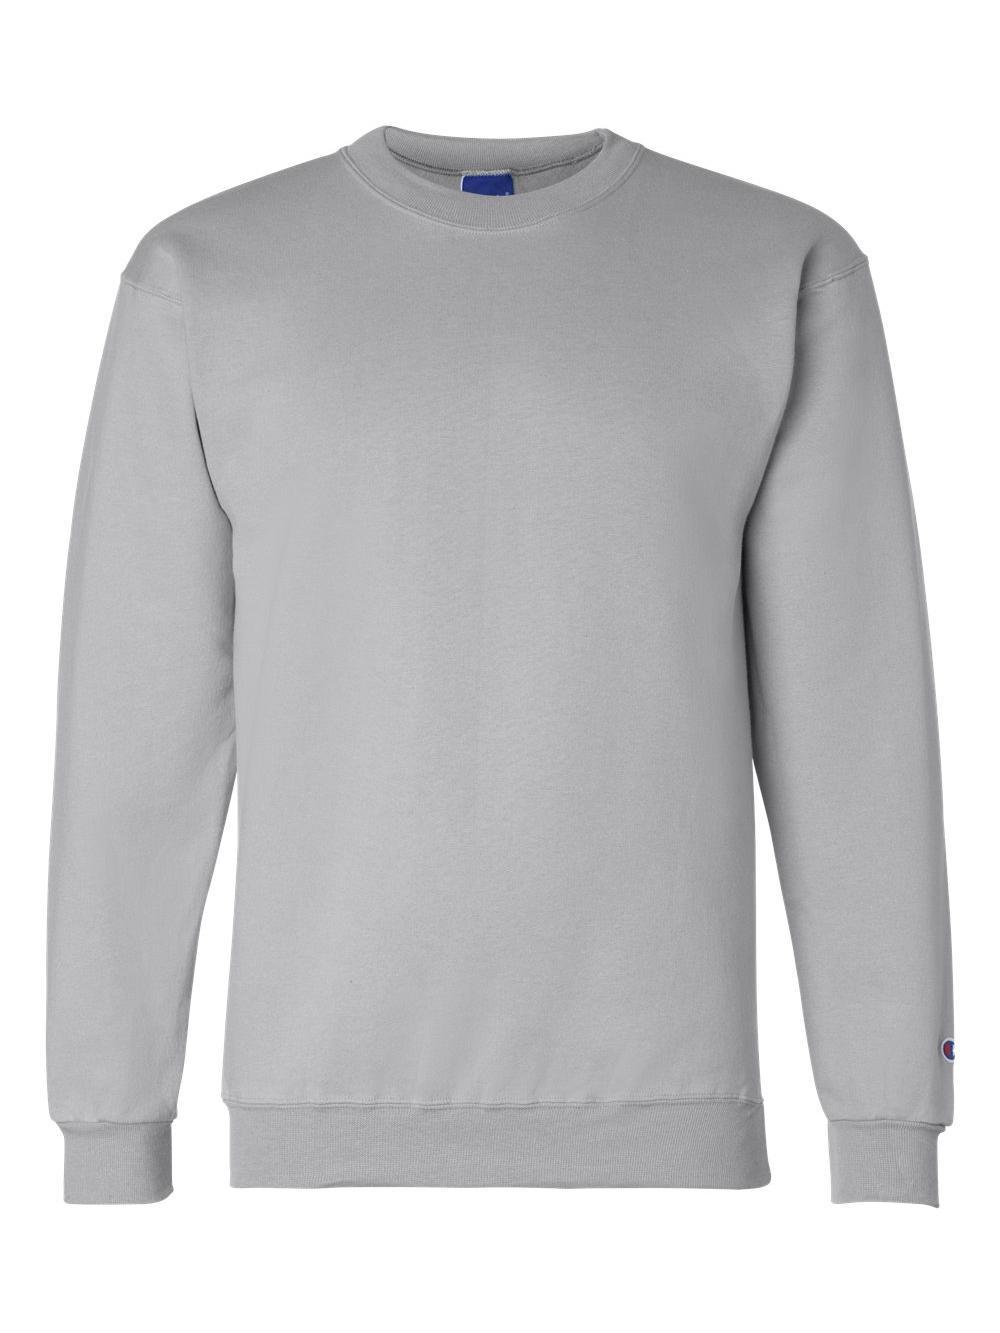 Champion-Double-Dry-Eco-Crewneck-Sweatshirt-S600 thumbnail 9